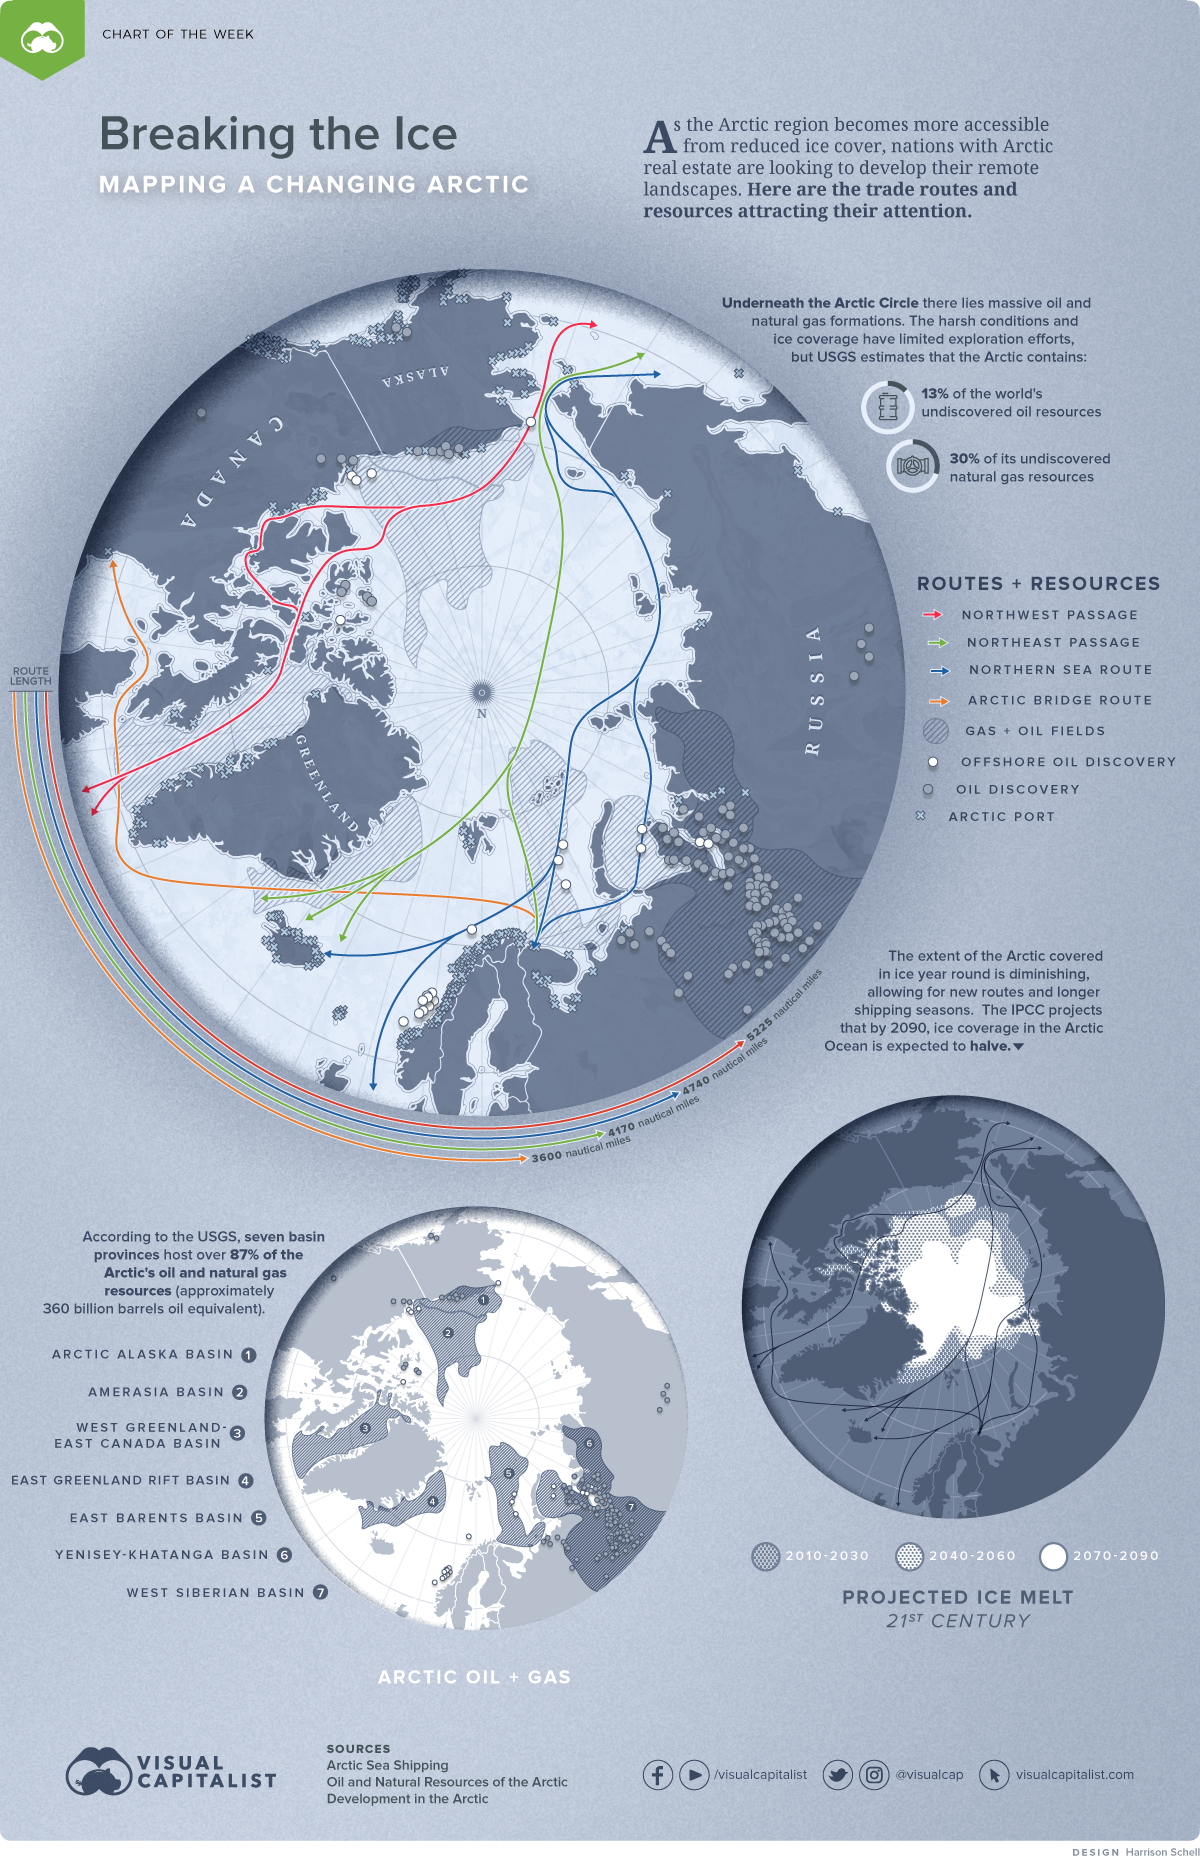 ice melt global warming climate change heat rising sea transport oil